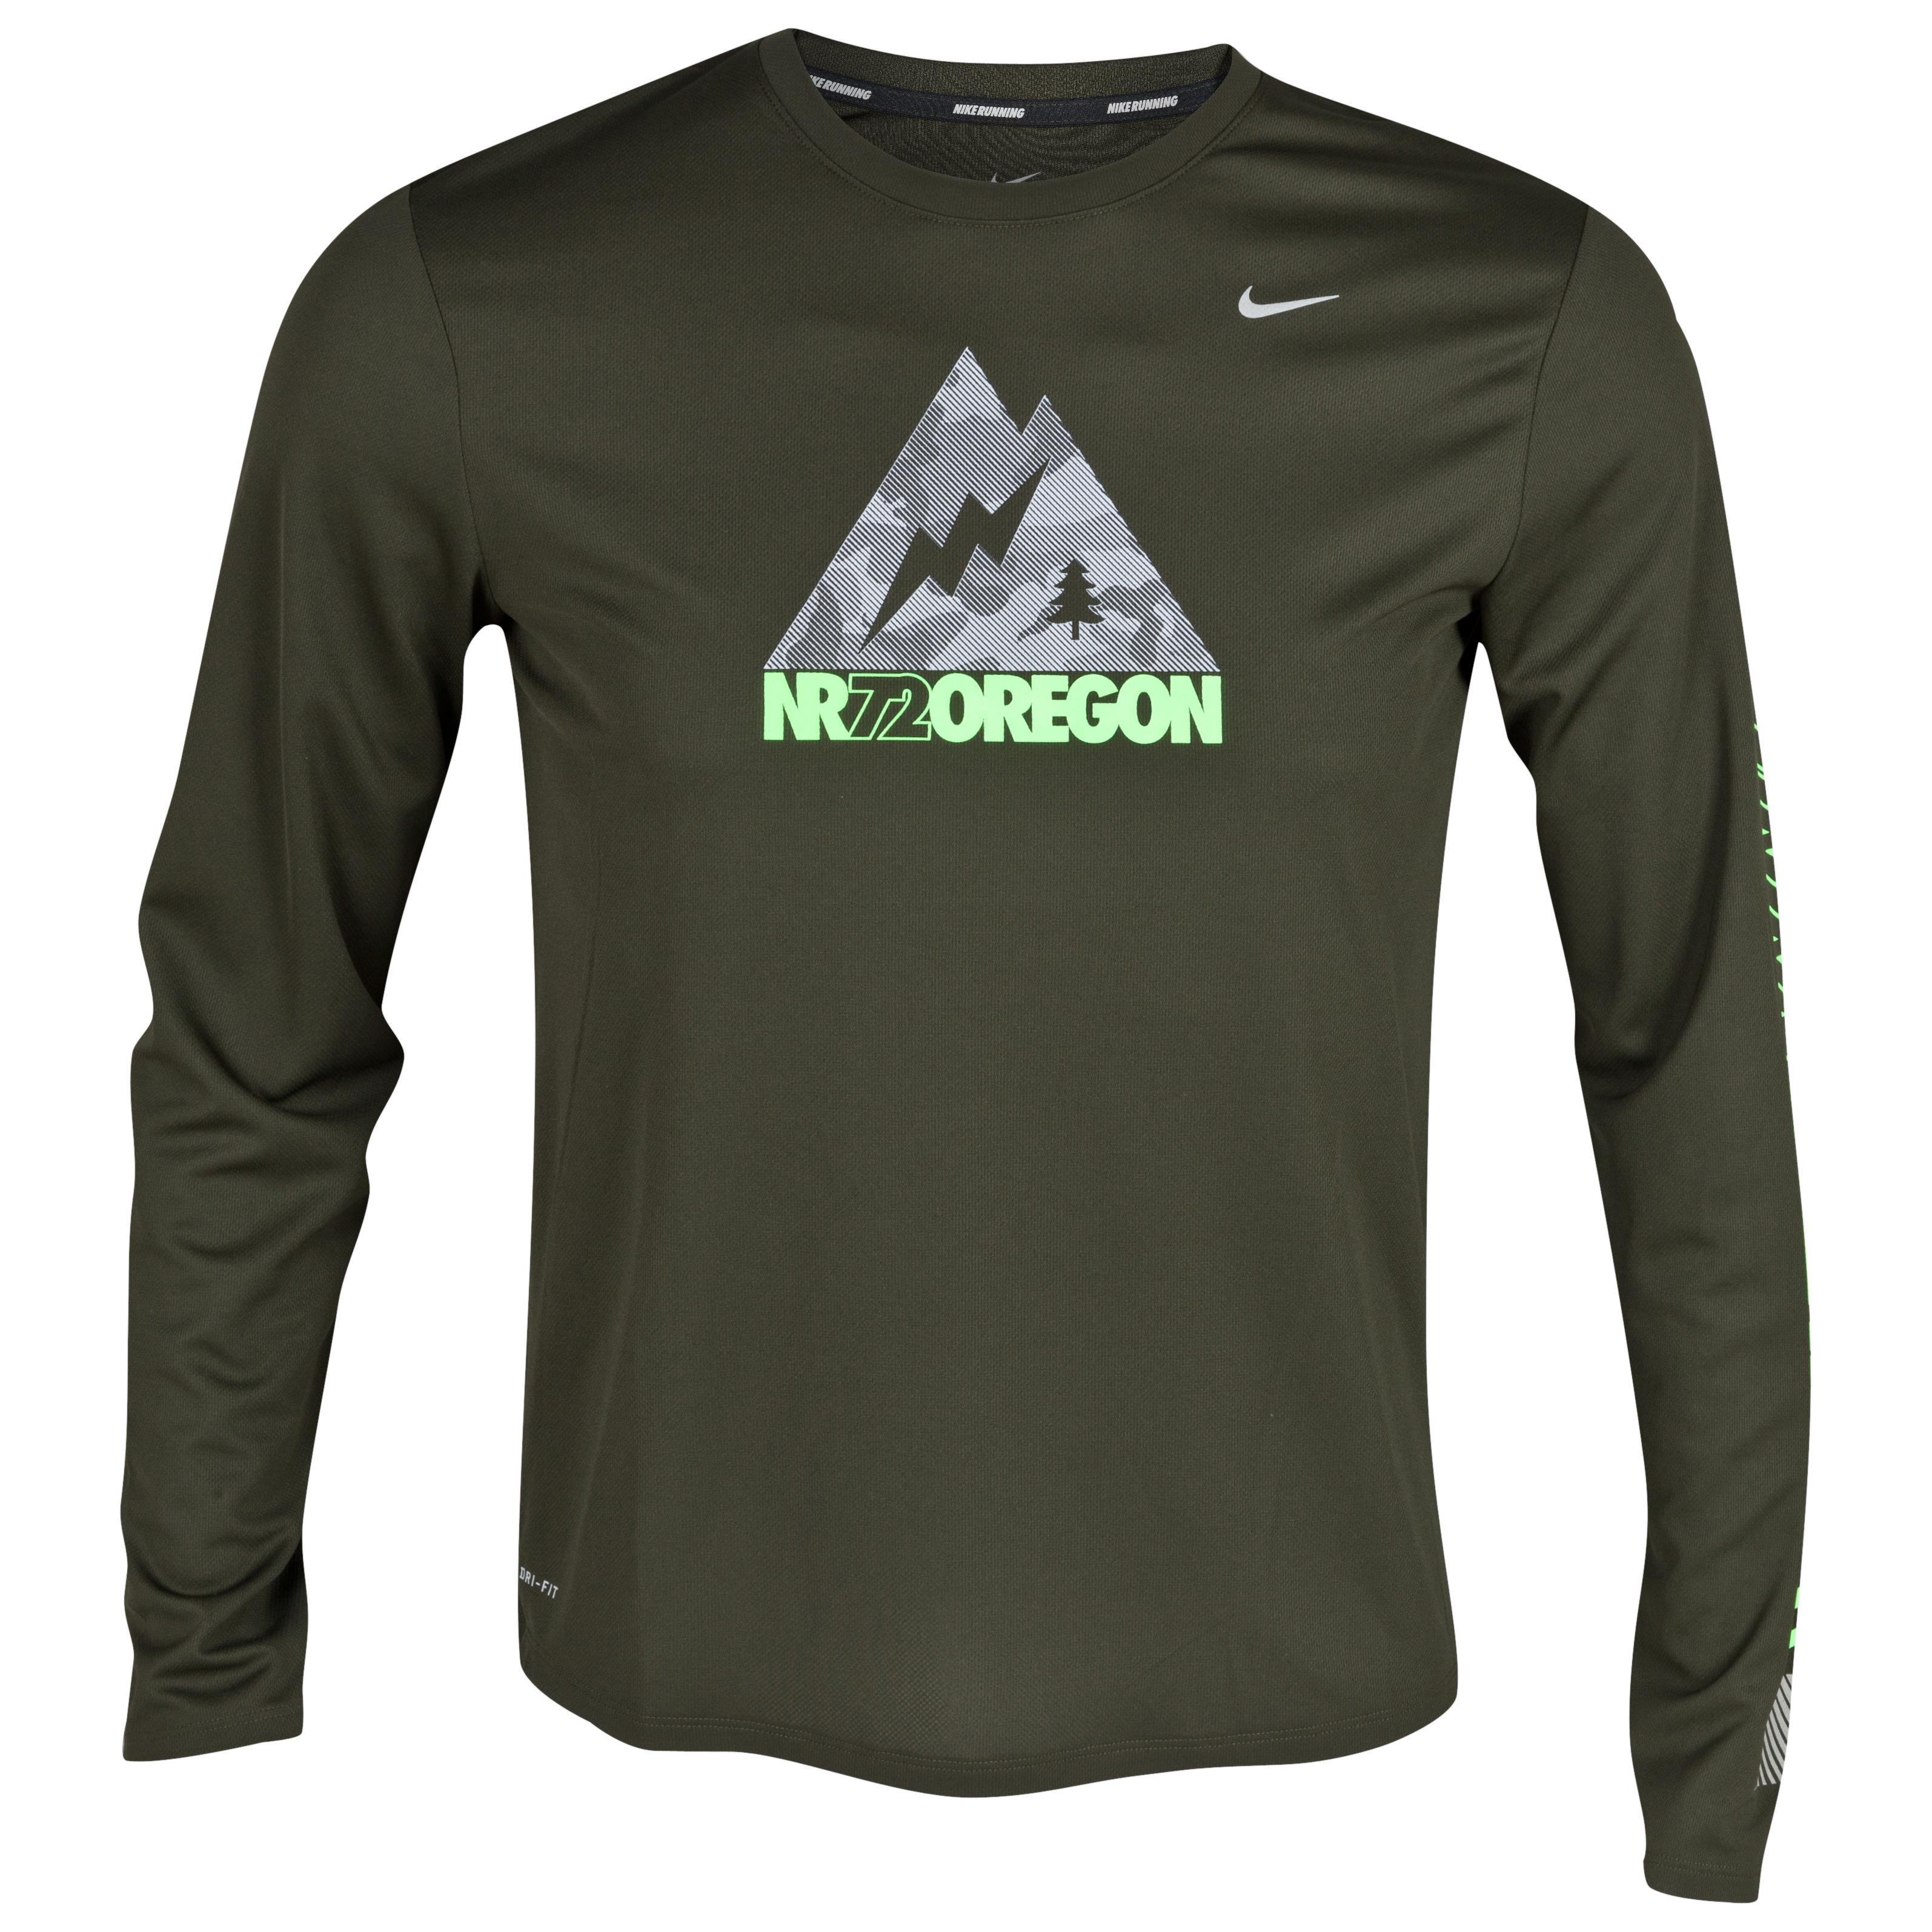 Nike Oregon T-Shirt - Sequoia/Reflective Silver - Long Sleeve